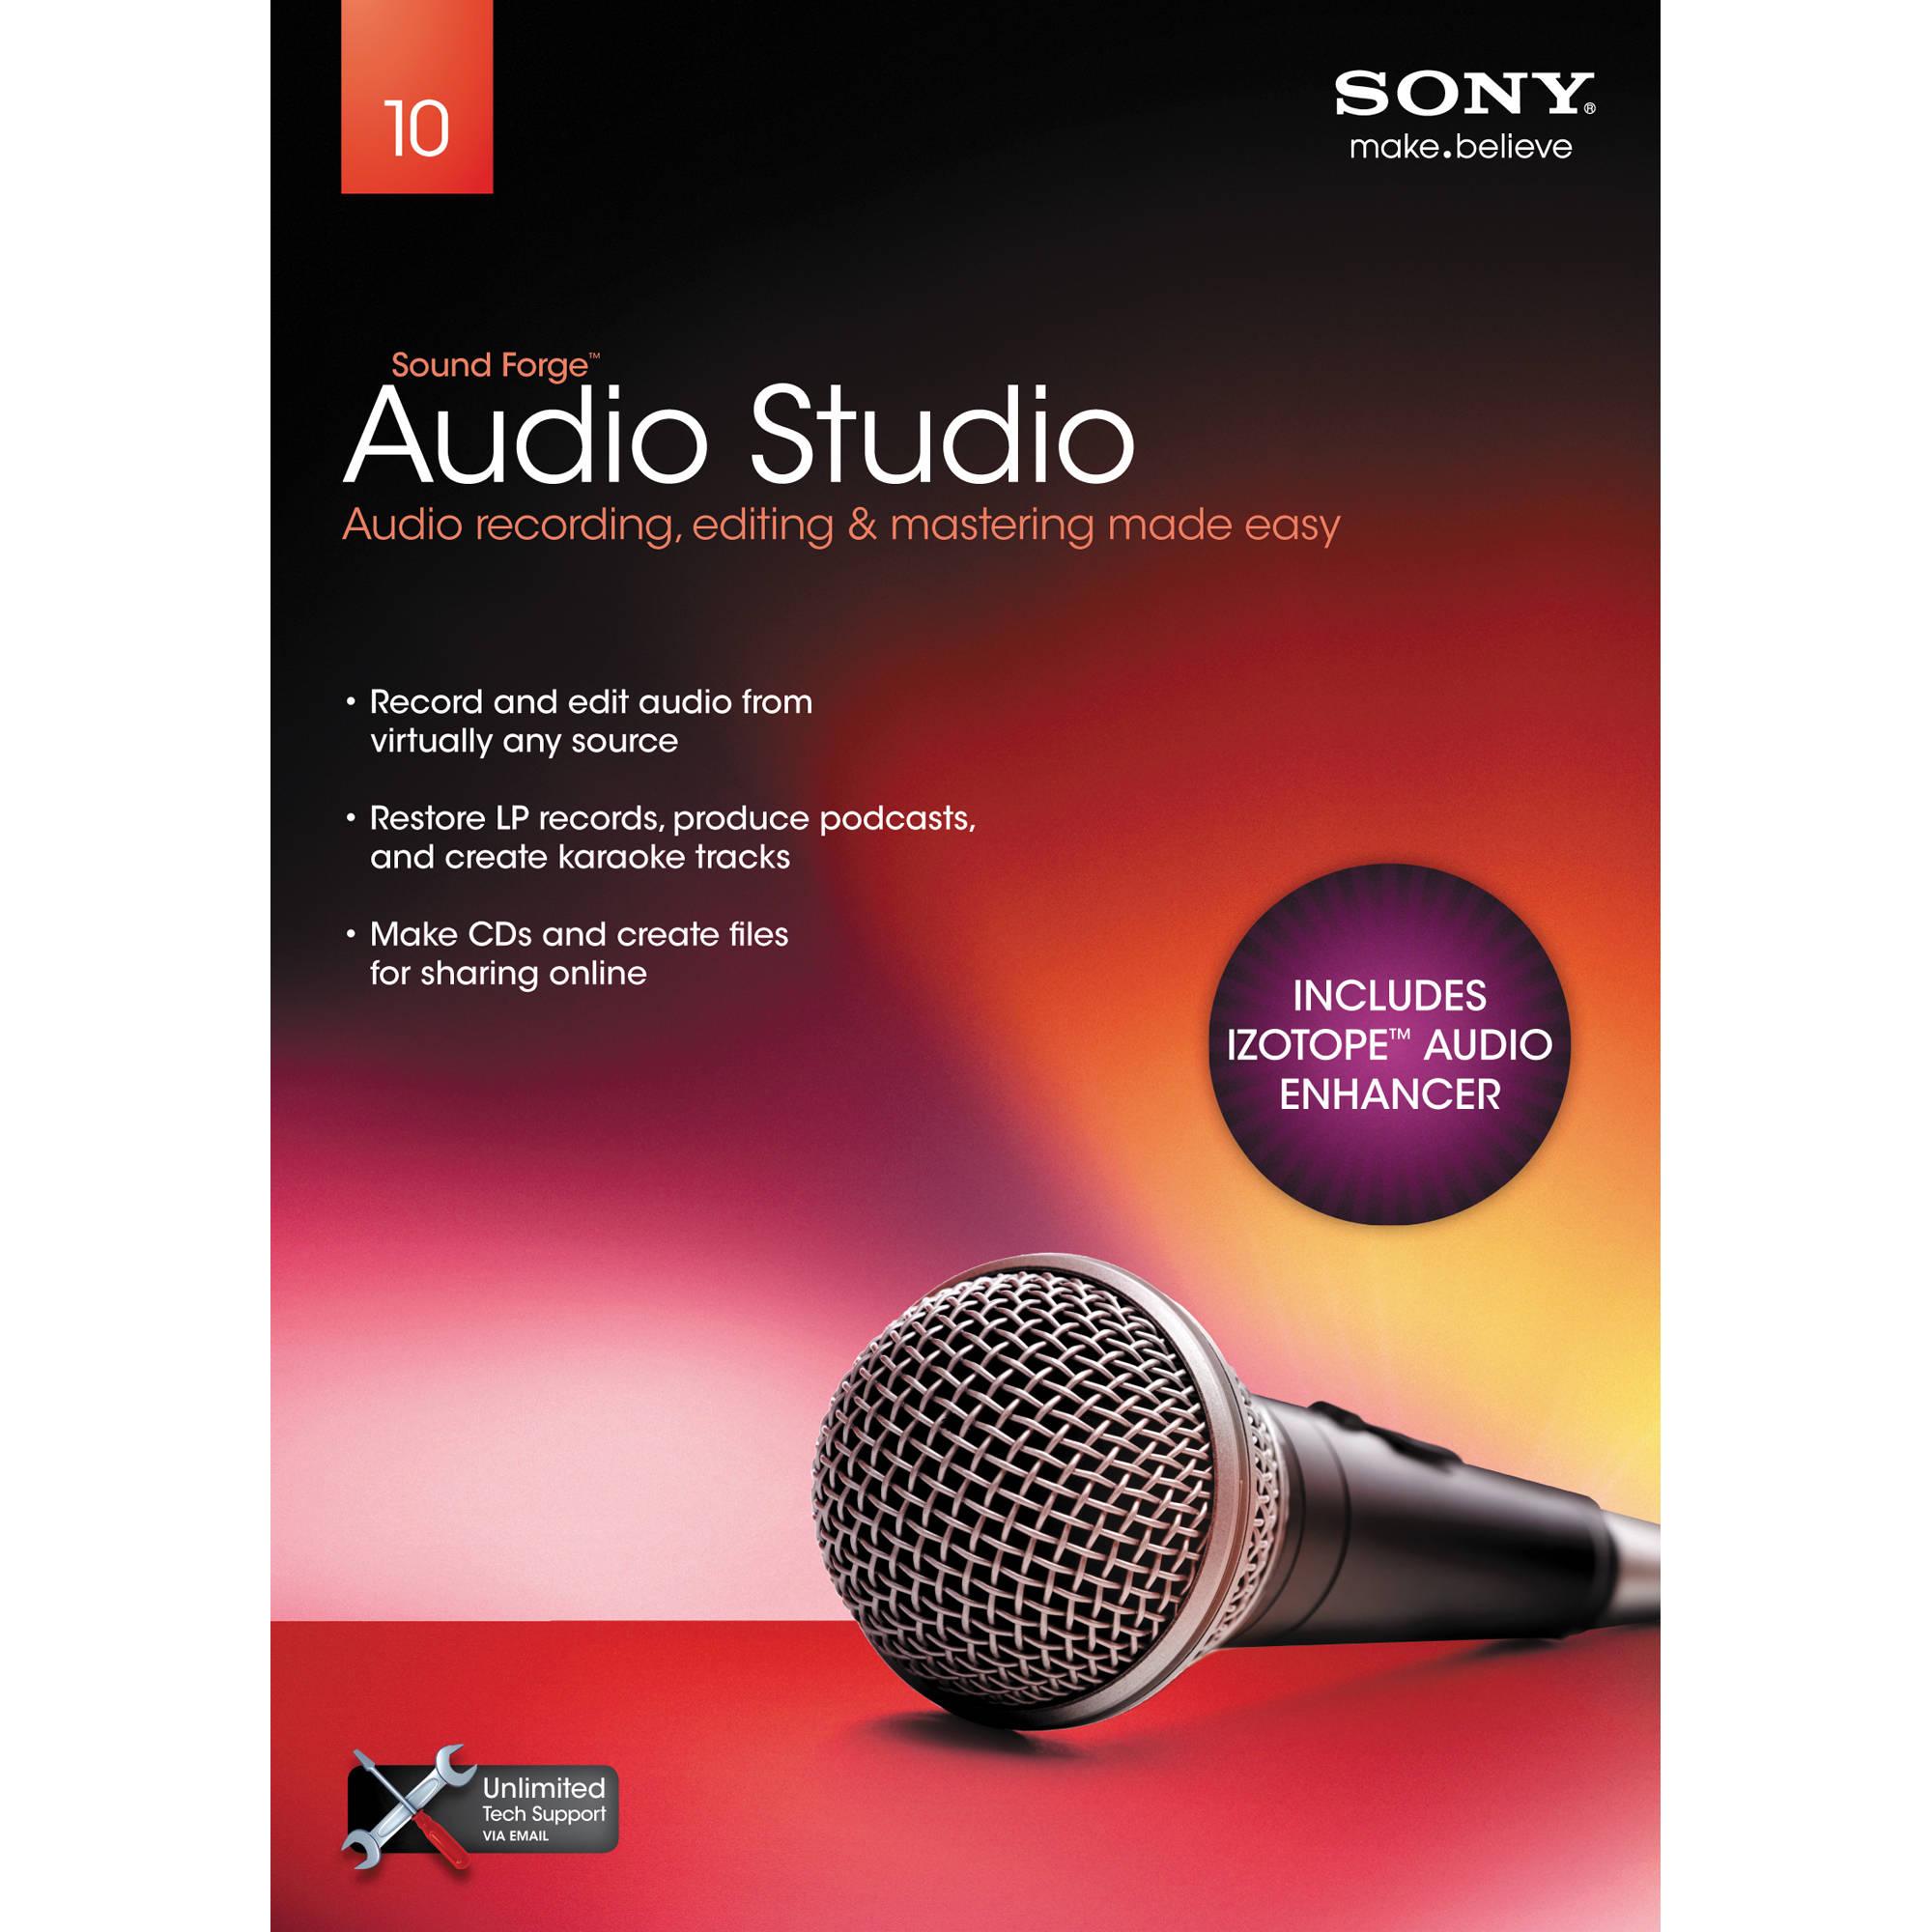 Sony Sound Forge Audio Studio 10 - Audio Recording, Editing, Mastering  Software